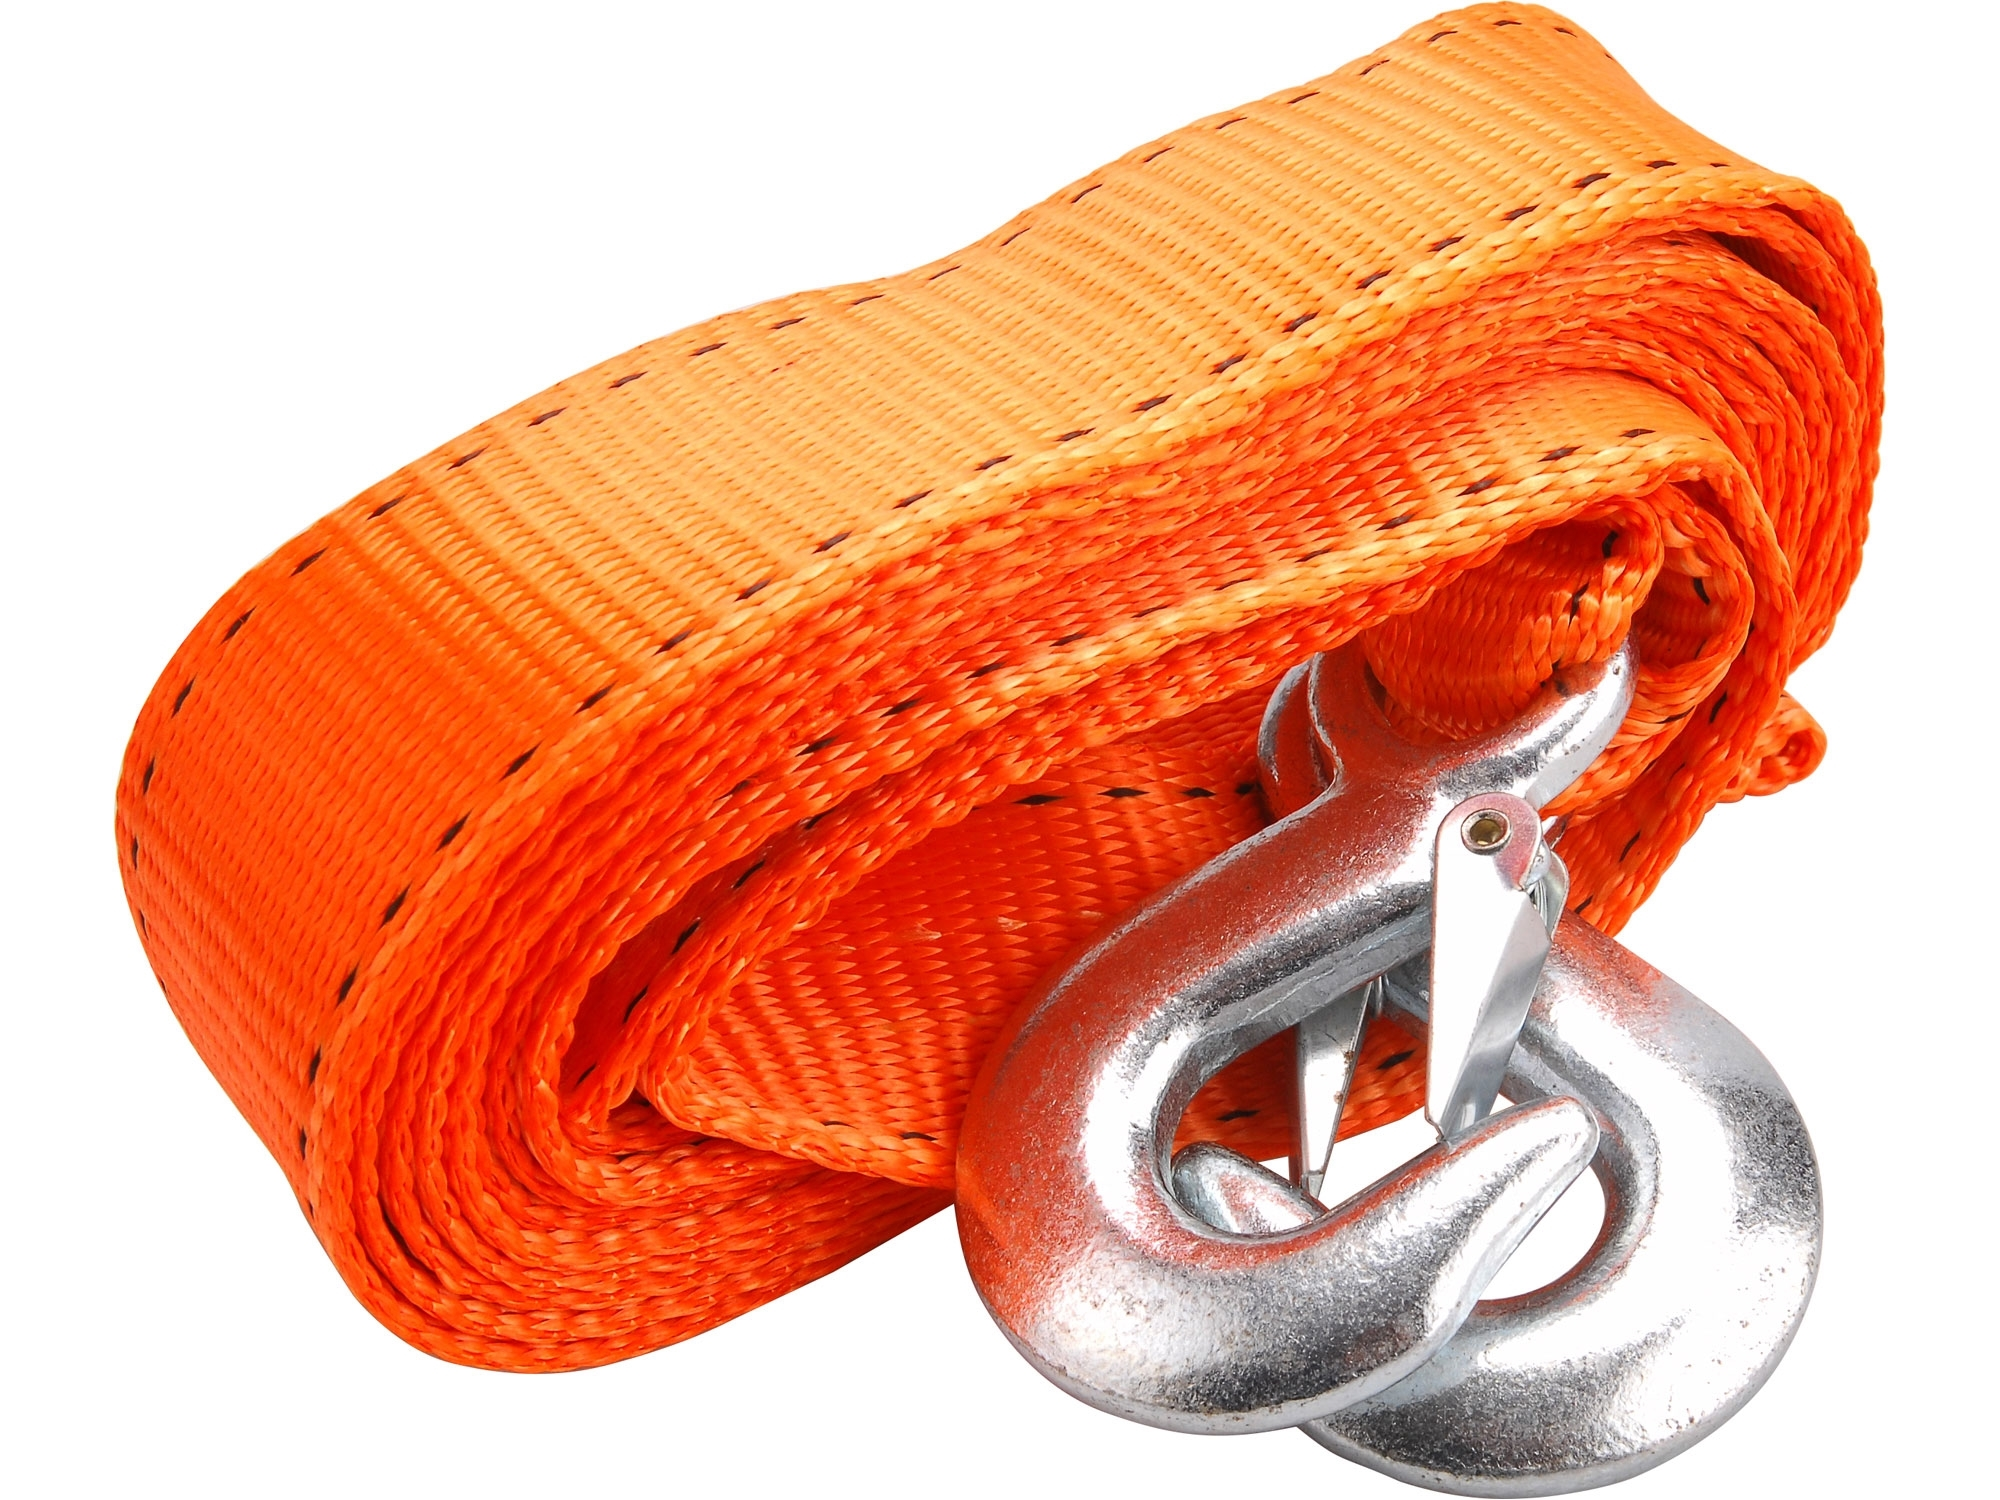 lano tažné - popruh s háky, 4m x 50mm, max. tažnost - 2800kg, EXTOL PREMIUM 8861160